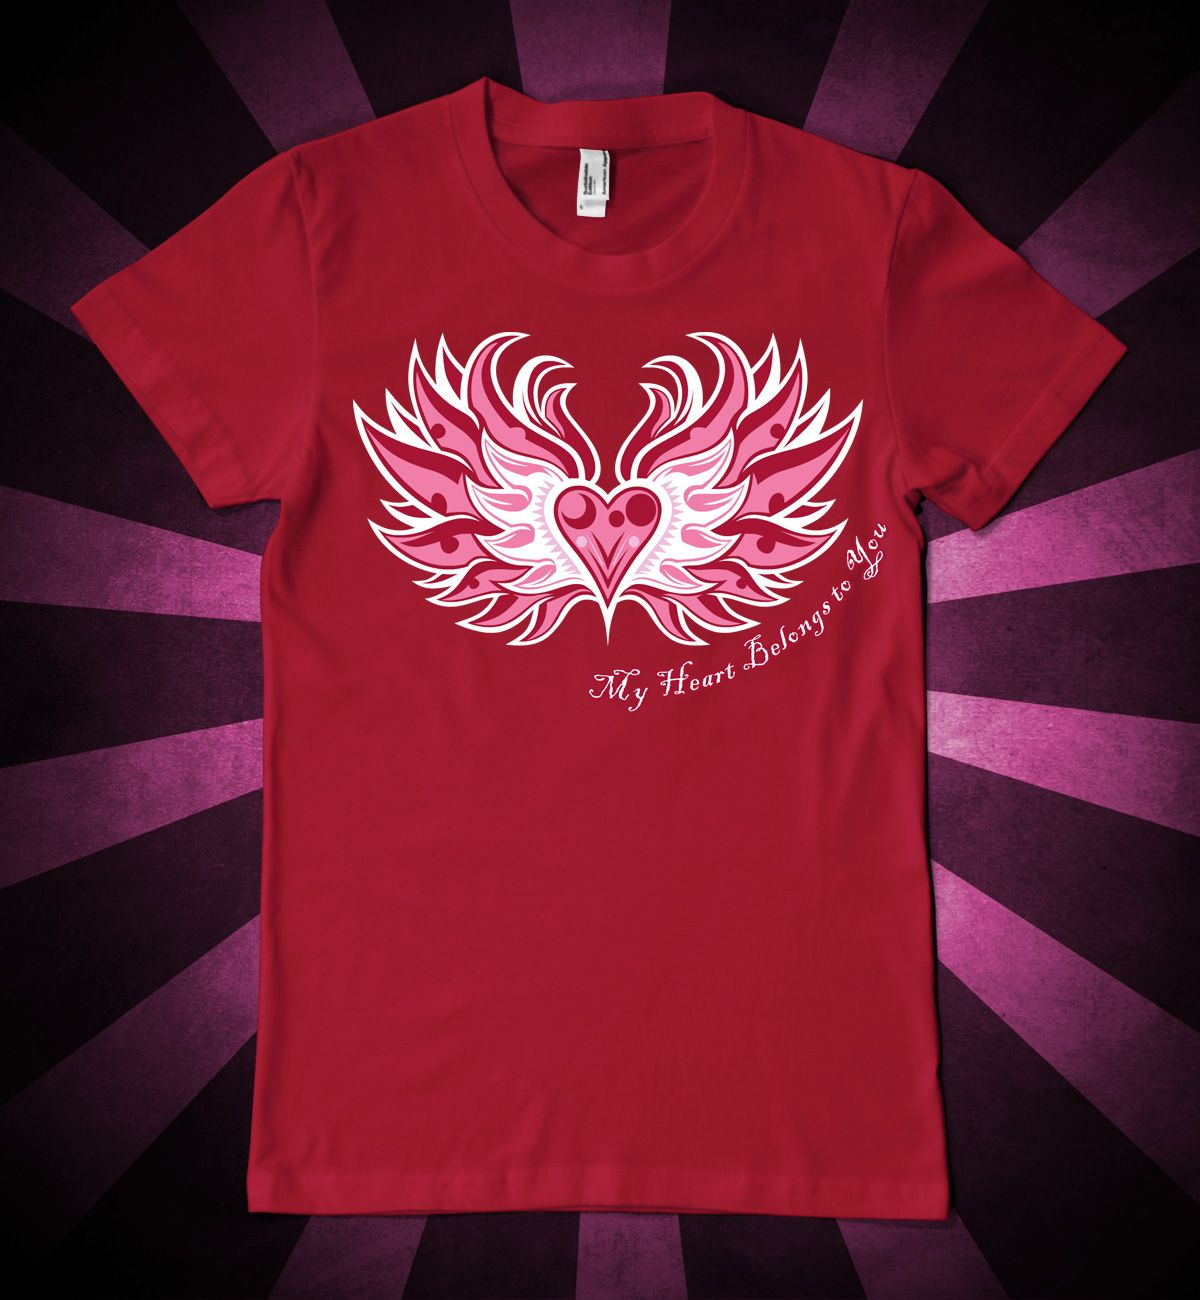 My Heart Belongs To You Valentine S Day T Shirt Design Valentine S